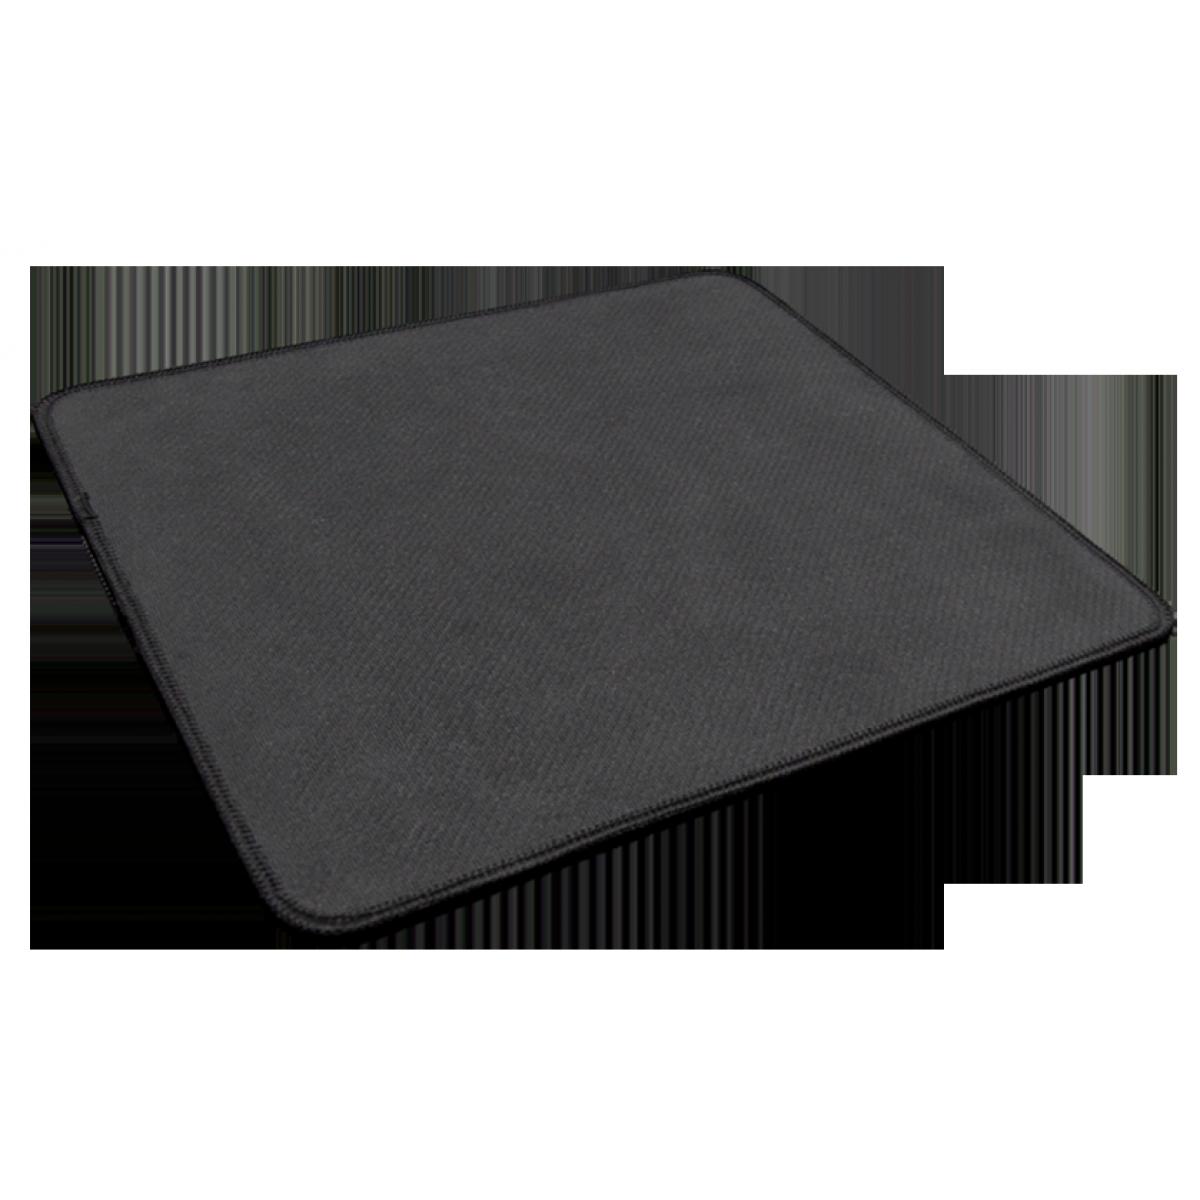 Mousepad Gamer Fantech Vigil, Black, 450x400mm, MP452